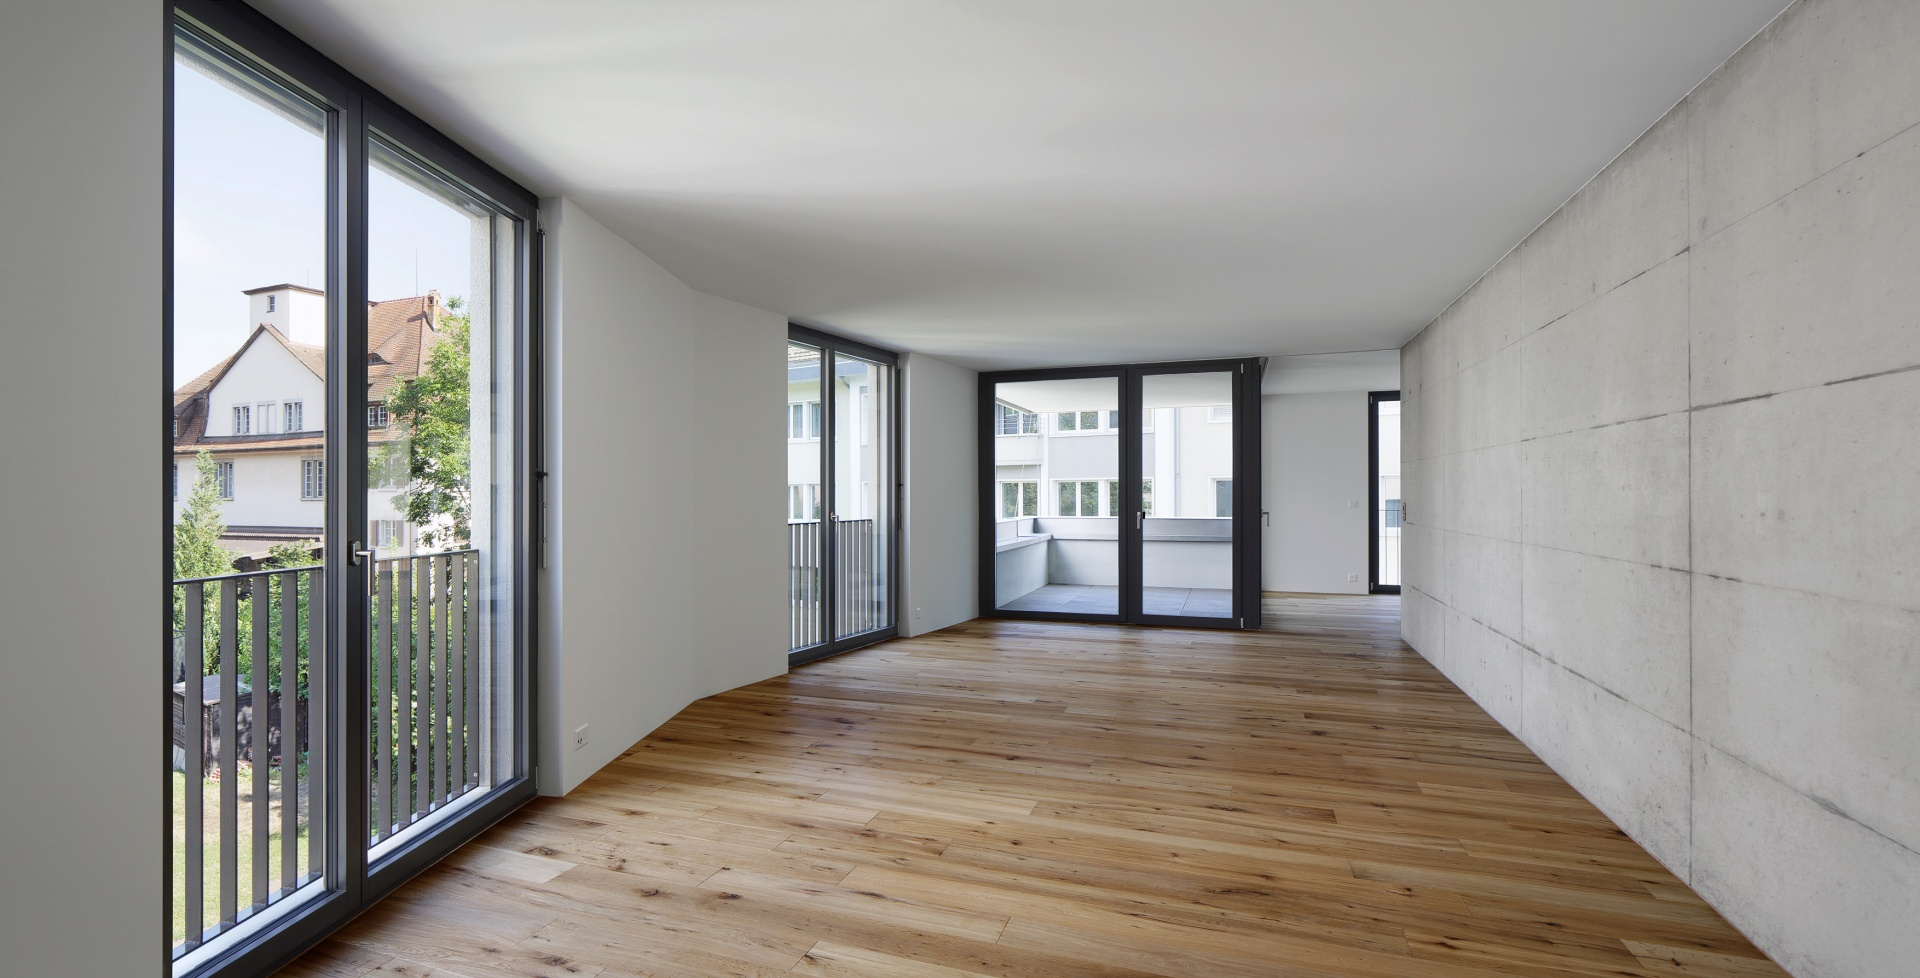 Sonnenweg_Wohnung © Tom Bisig, Basel